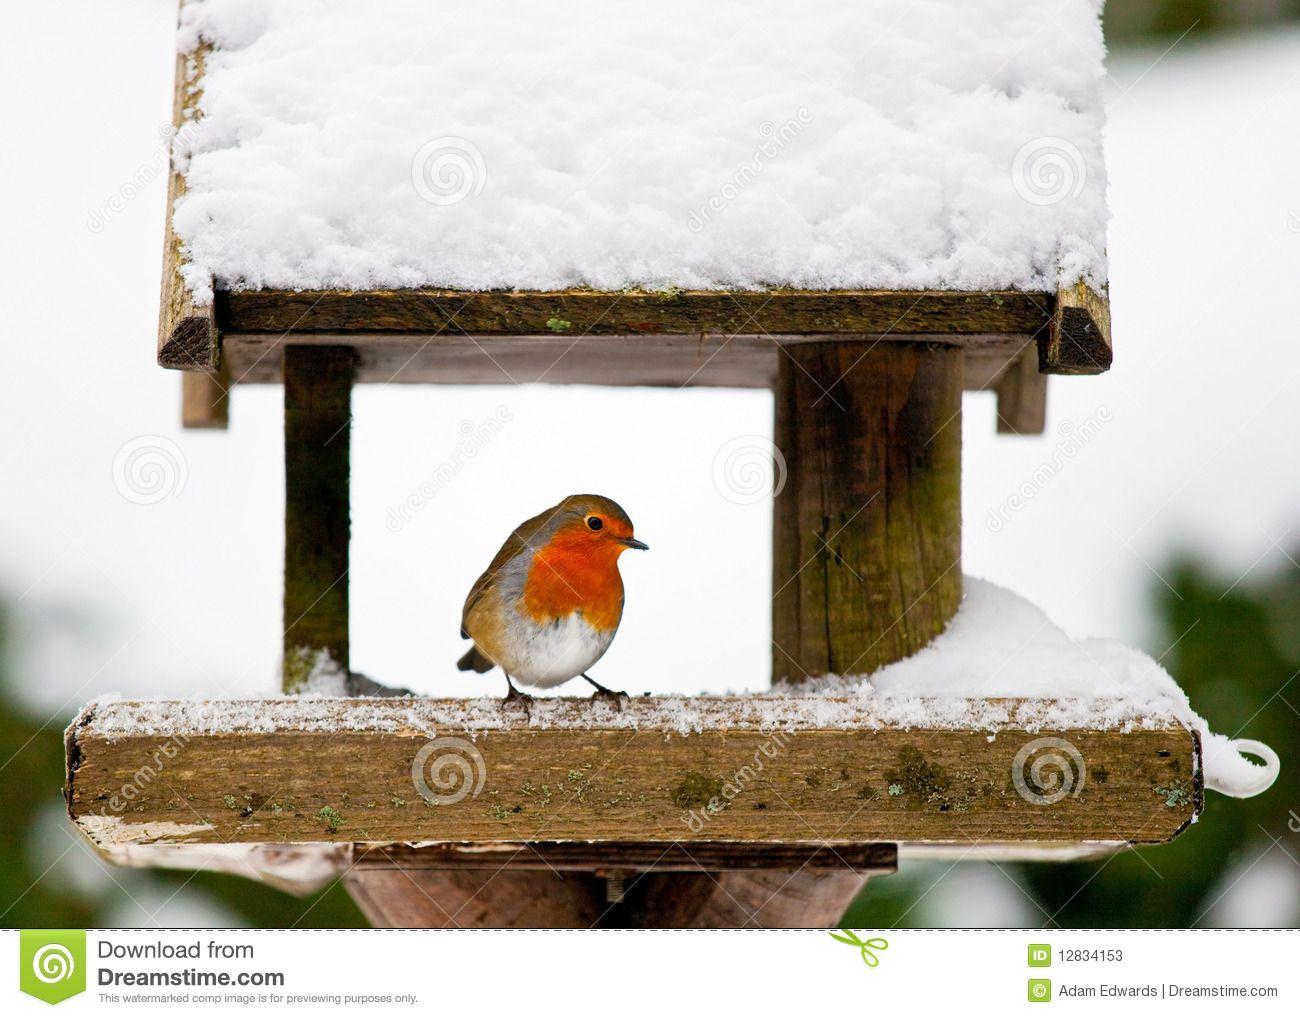 bird houses in the snow | Robin At A Snowy Bird Feeder In Winter Stock Photos - Image: 12834153